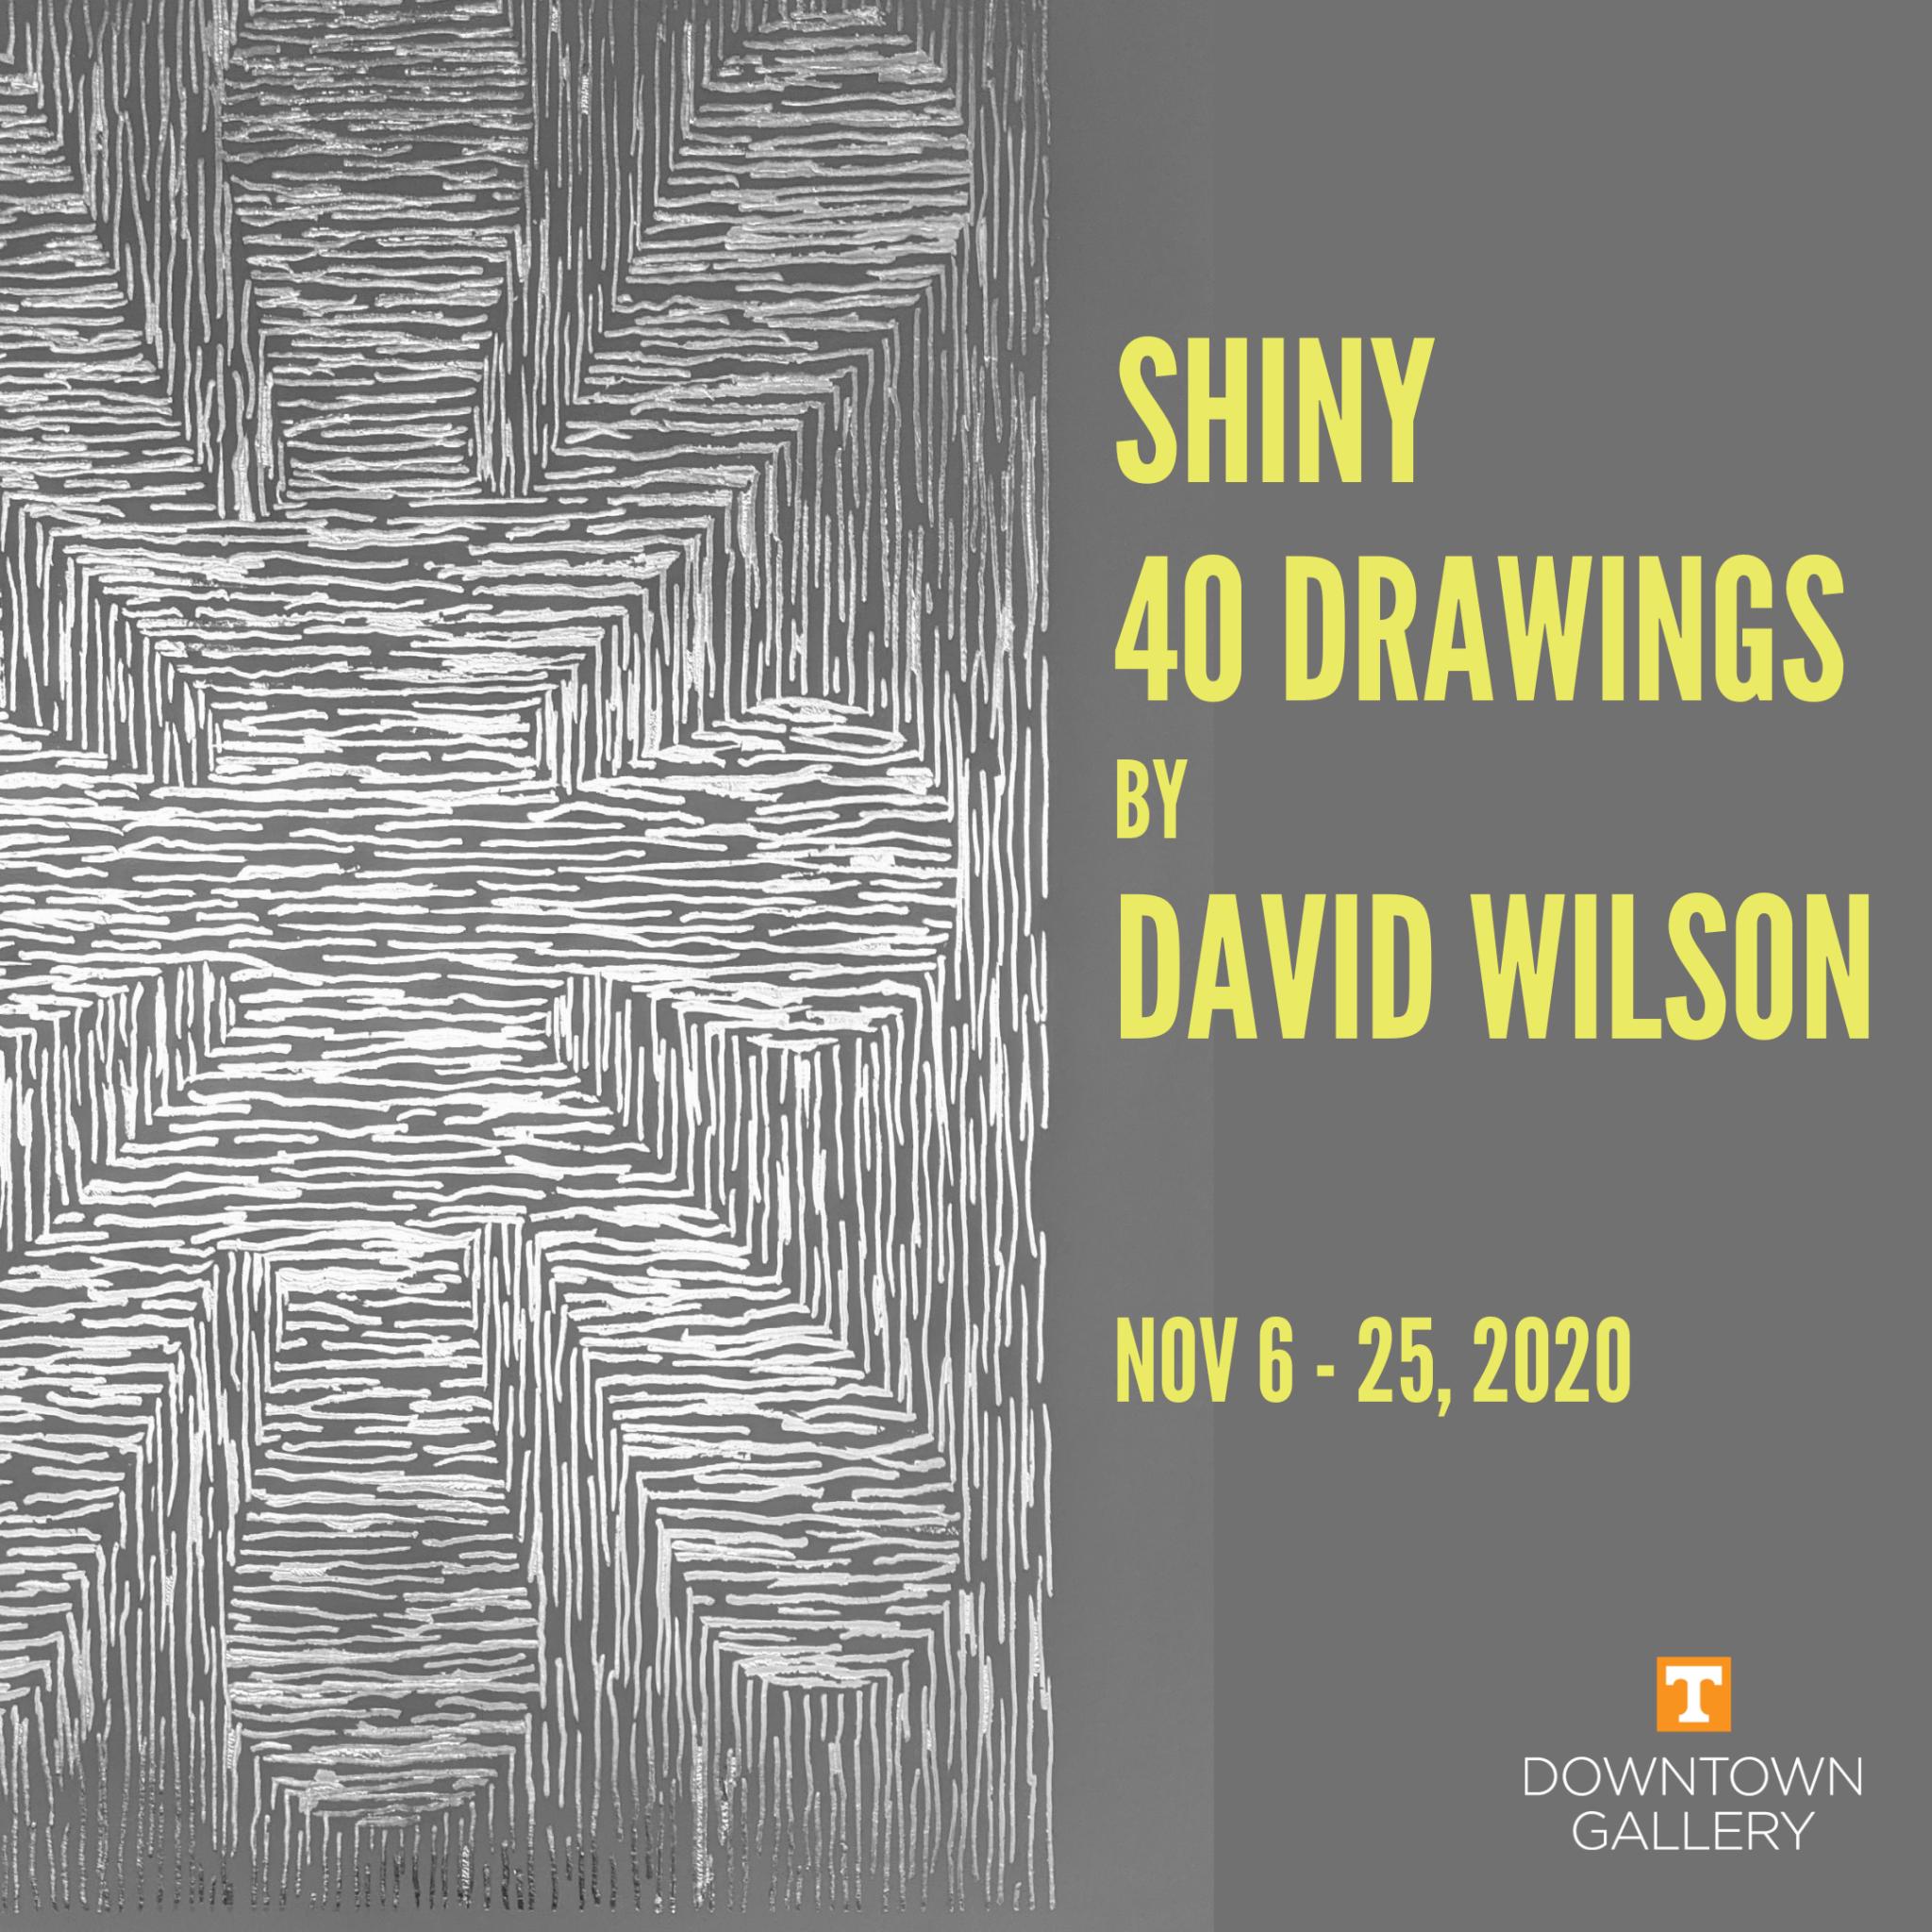 Shiny – 40 Drawings by David Wilson